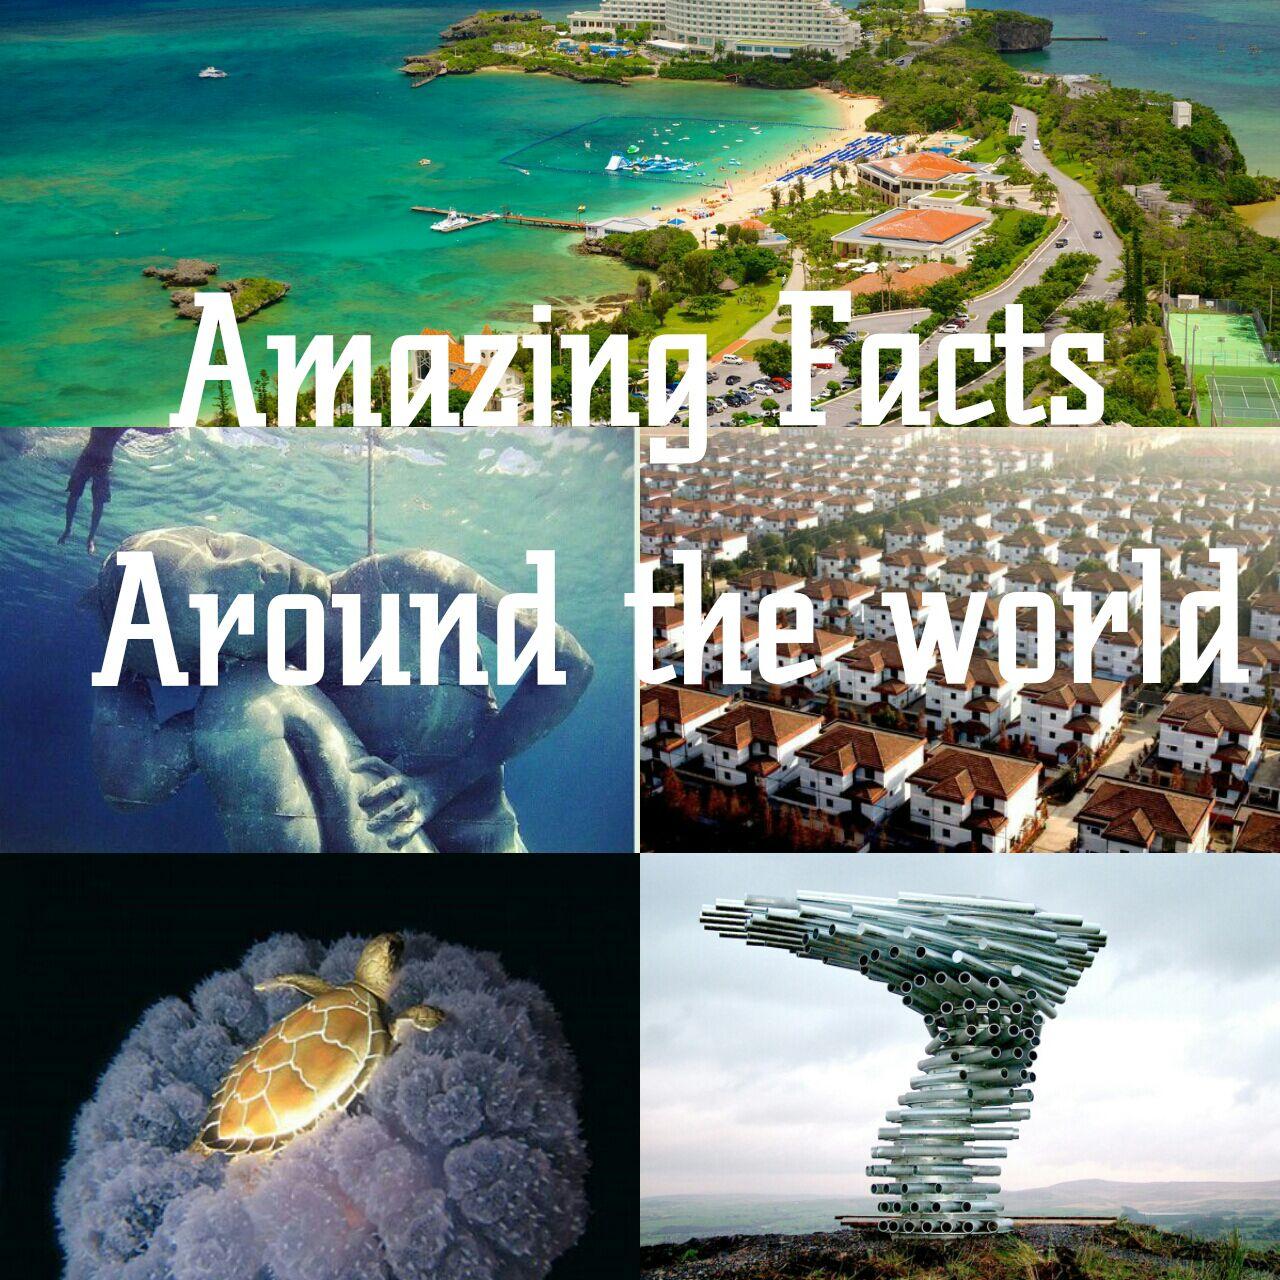 amazing facts around the world